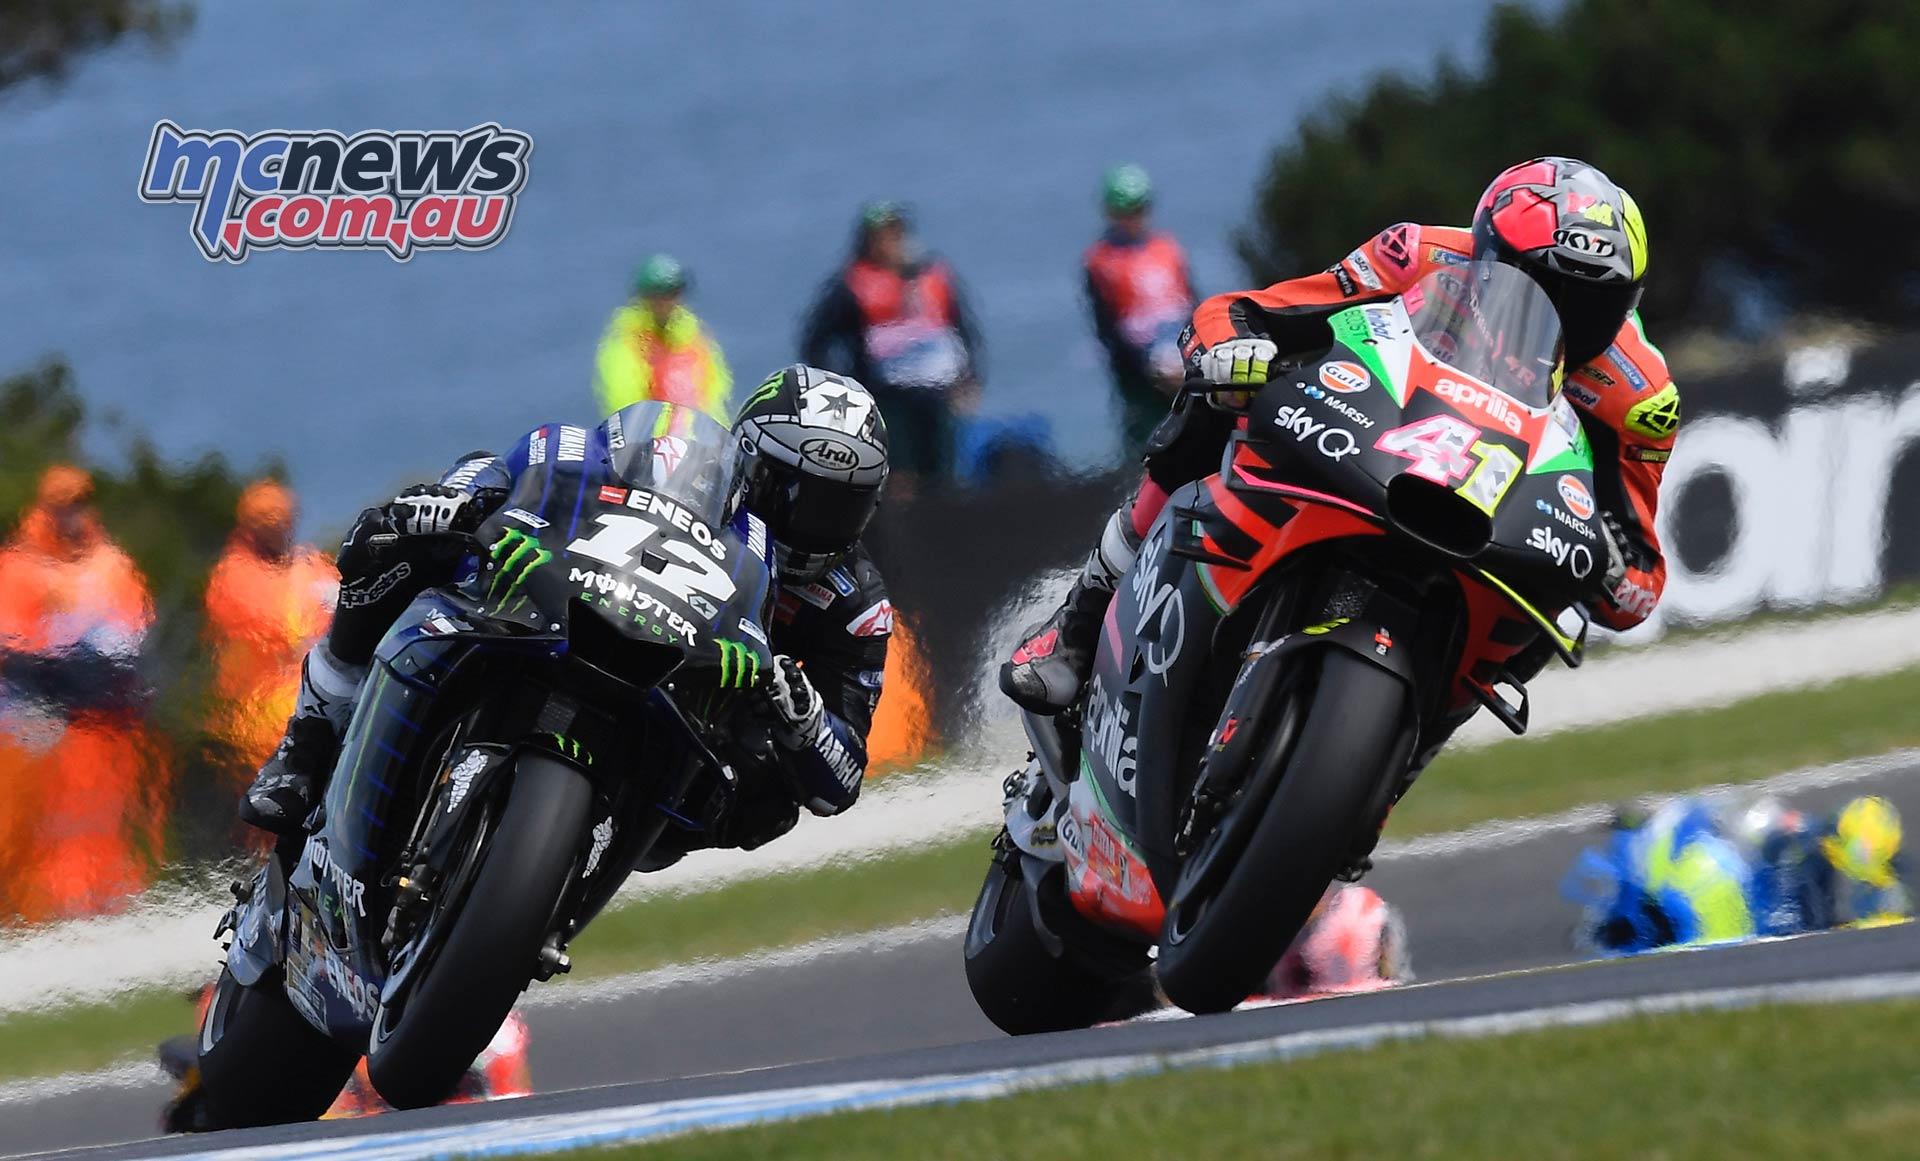 MotoGP Phillip Island Australia Race Aleix Espargaro Maverick Vinales